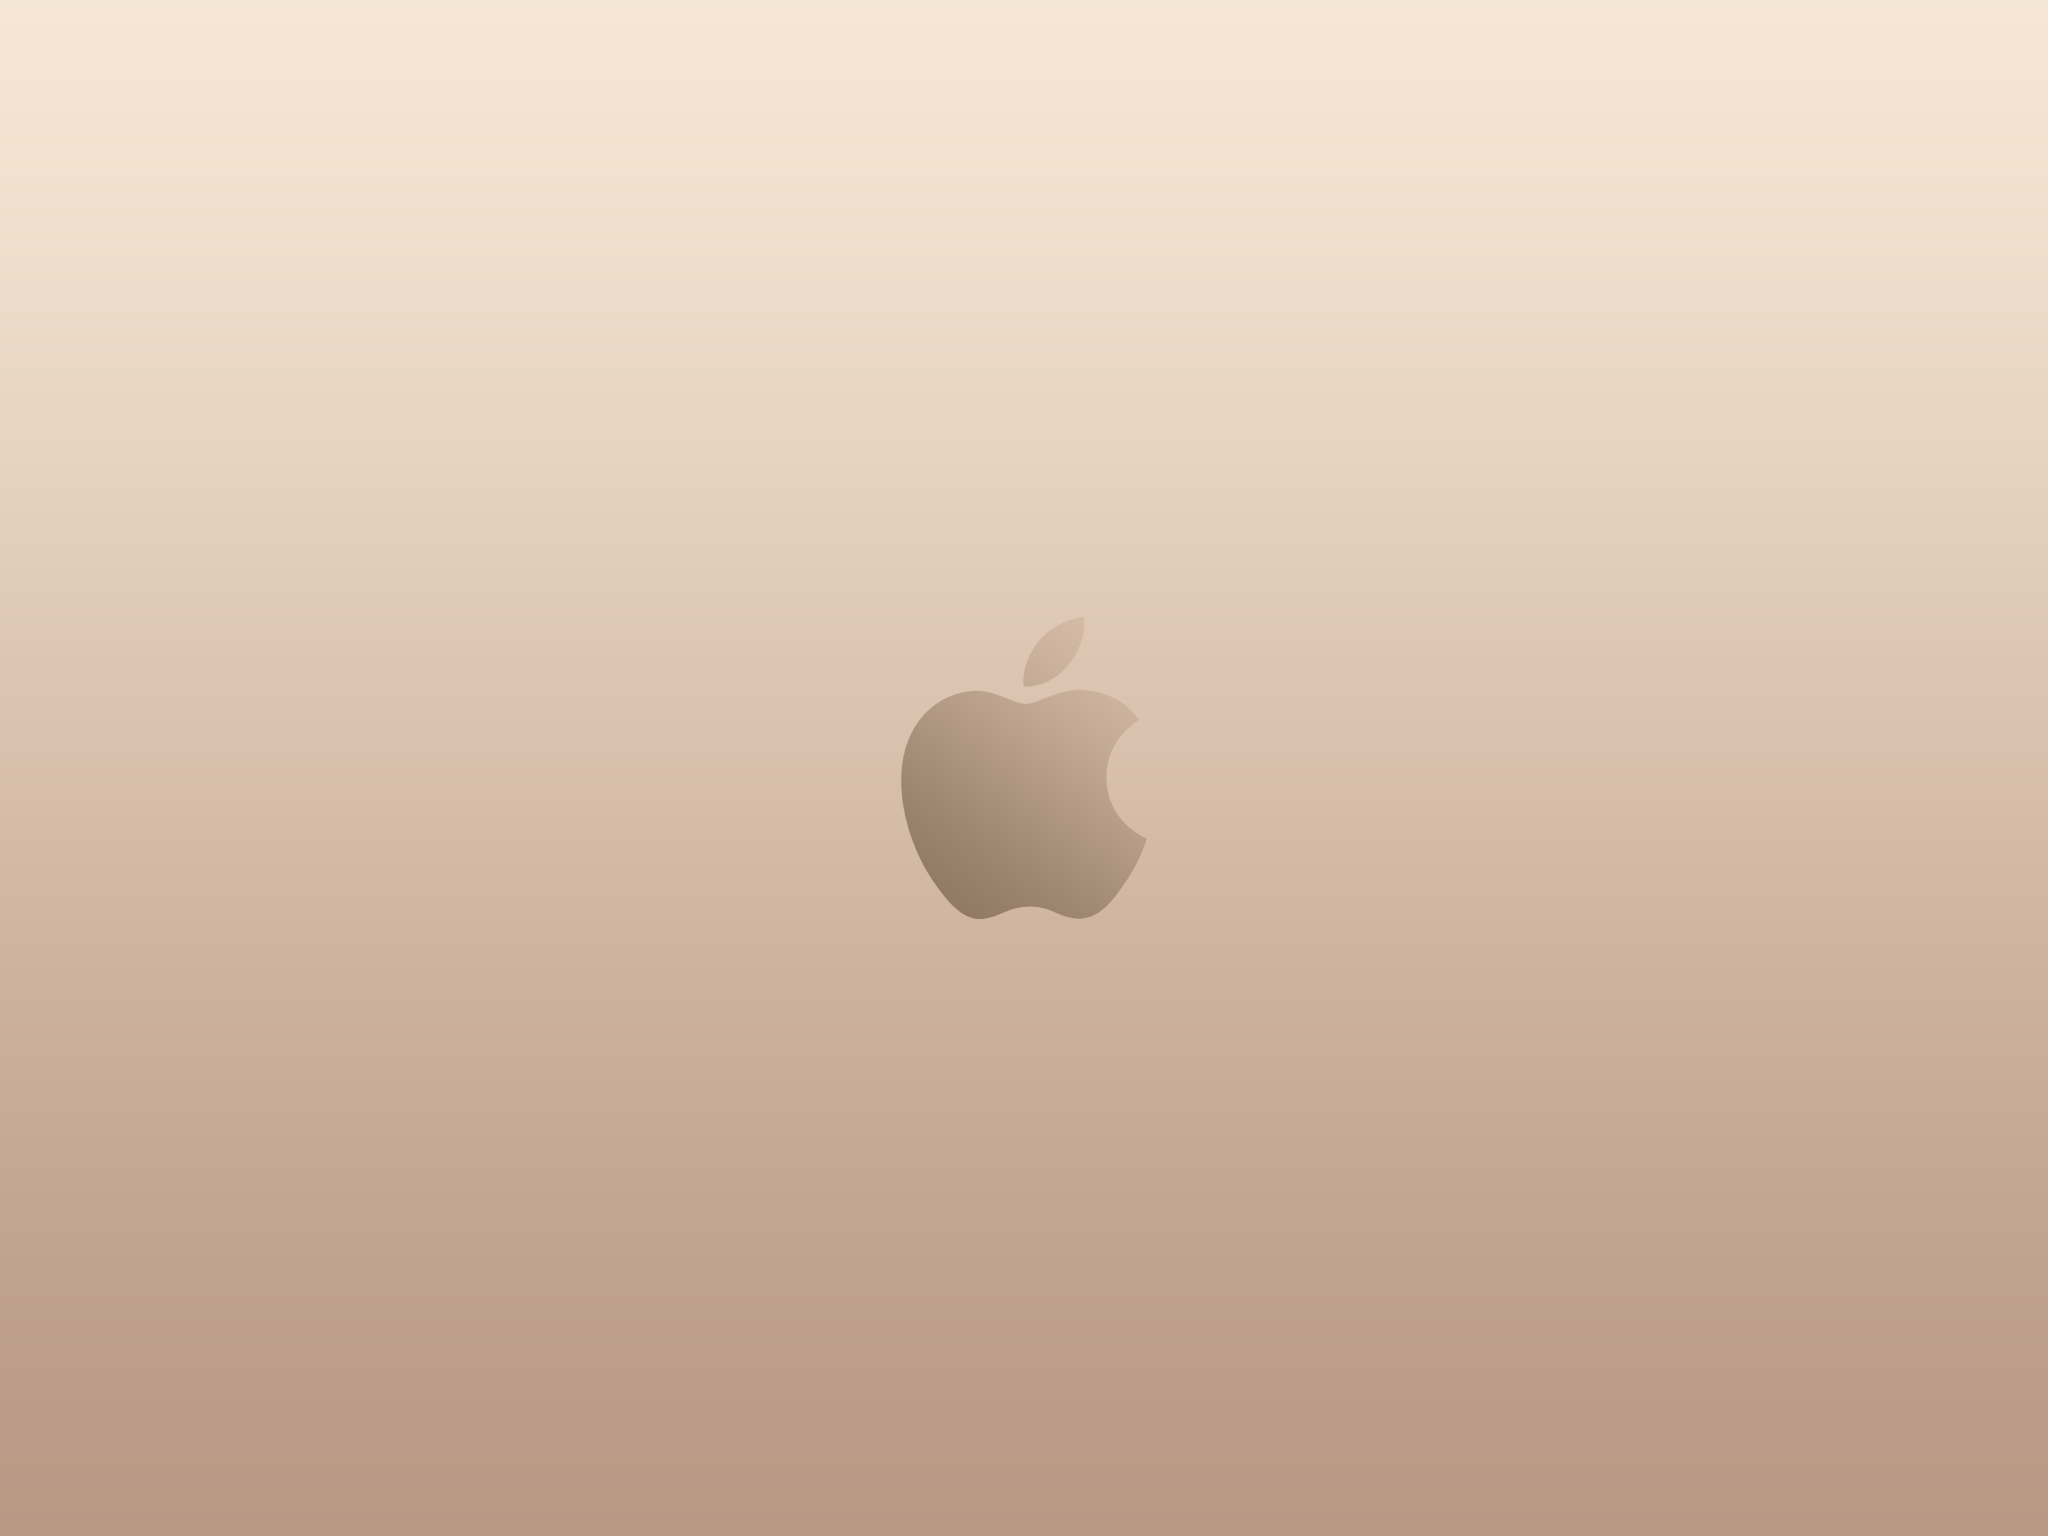 Pin On Ipad Pro Others Wallpaper: Apple_logo_by_griifax-dawcmna.jpg 1,080×960 Pixels